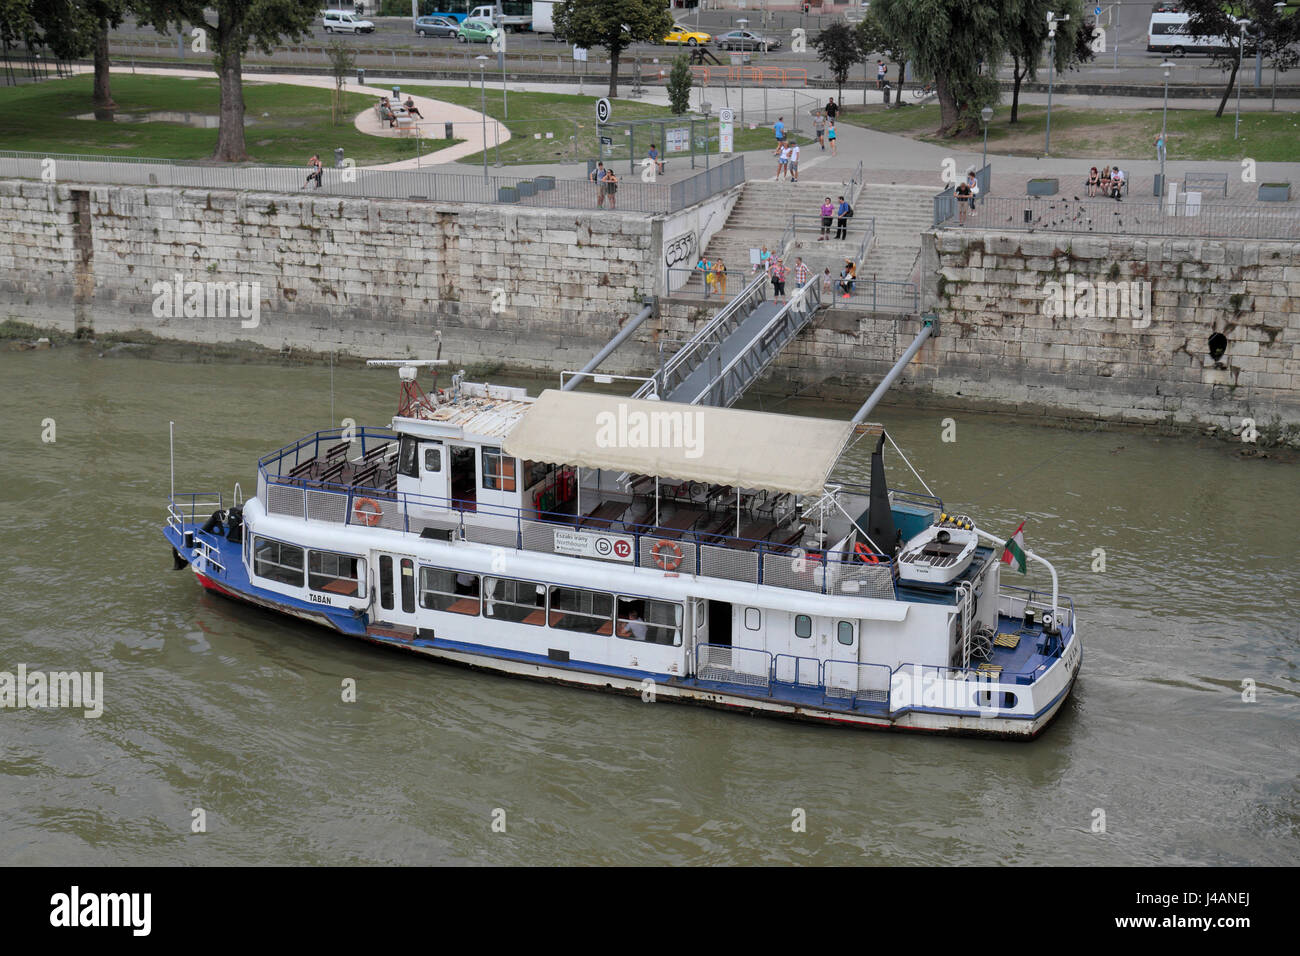 Public transport boat No 12 boat on the River Danube